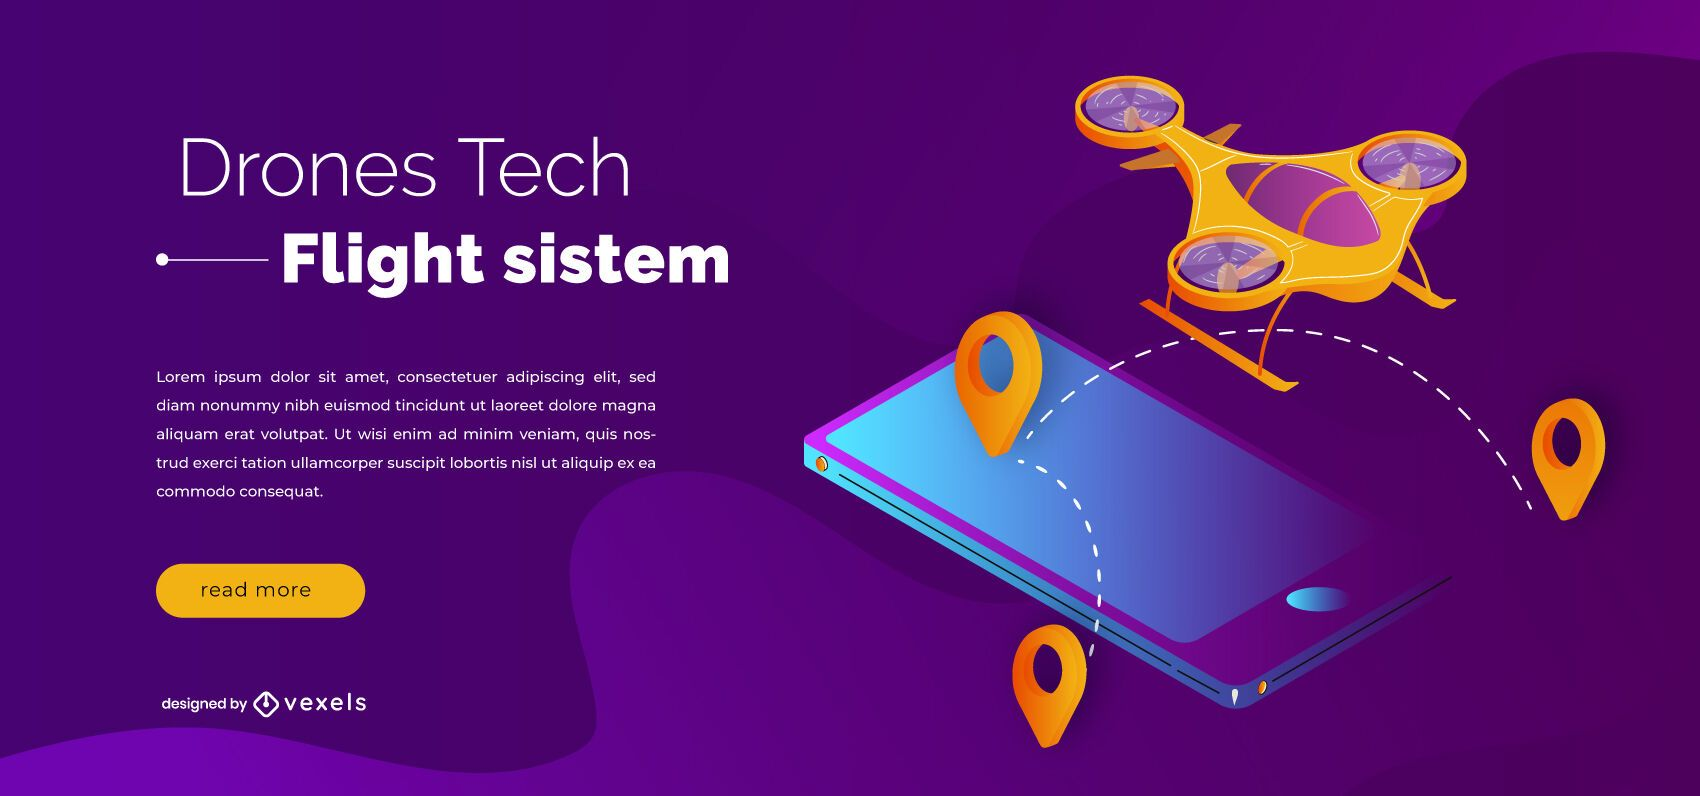 Drones tech slider design